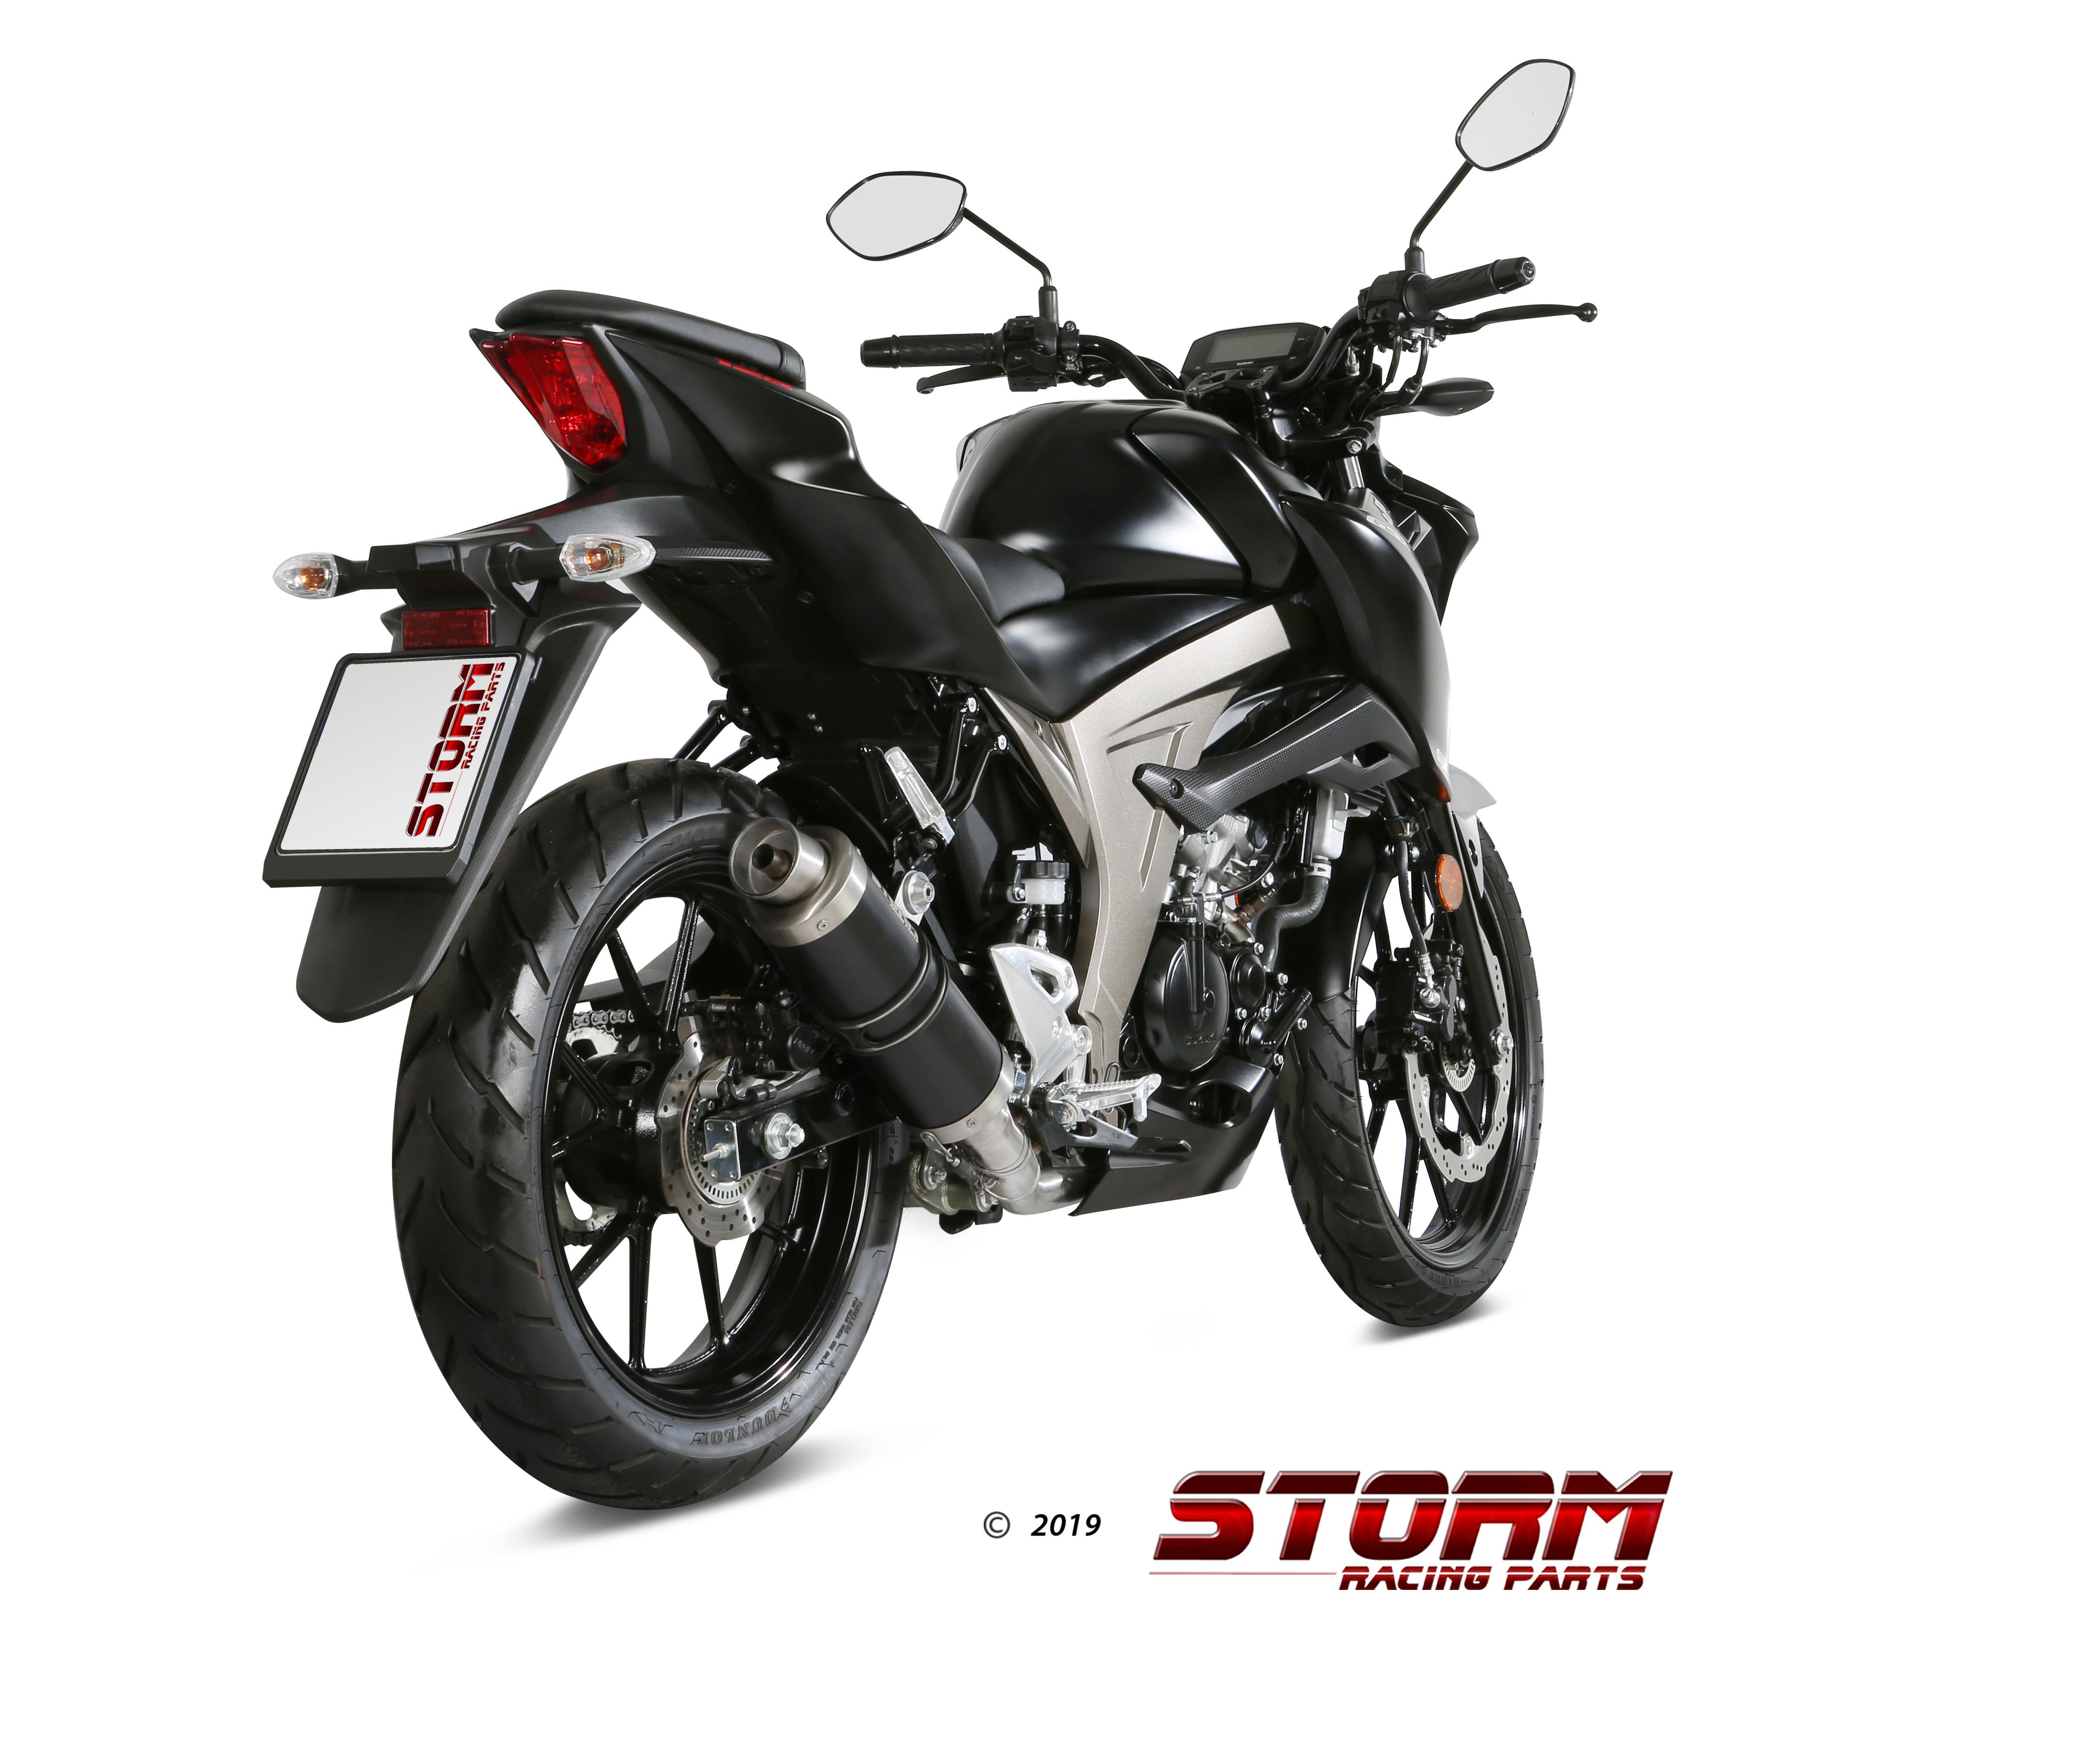 Storm HEAT SHIELD COVER 74.ACC.050.0 for SUZUKI GSX-S 125